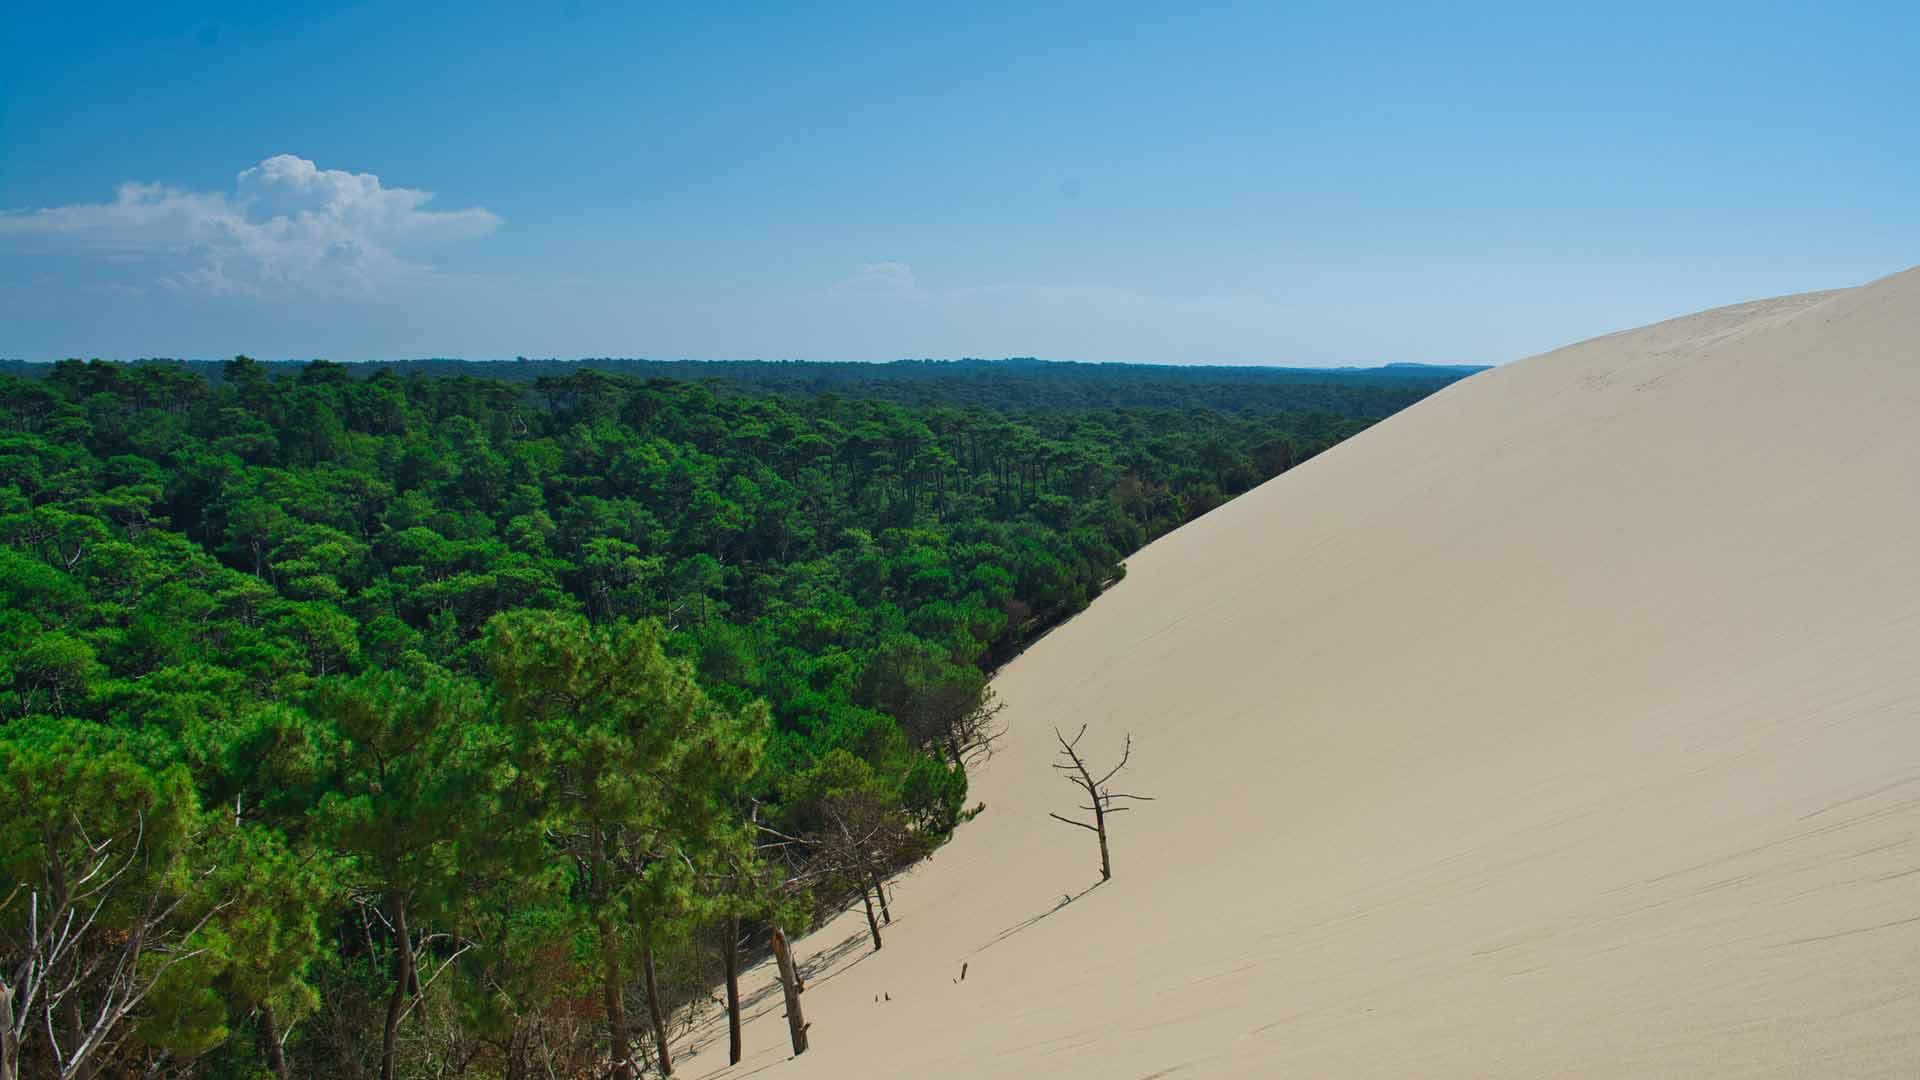 sommet de la dune du pilat